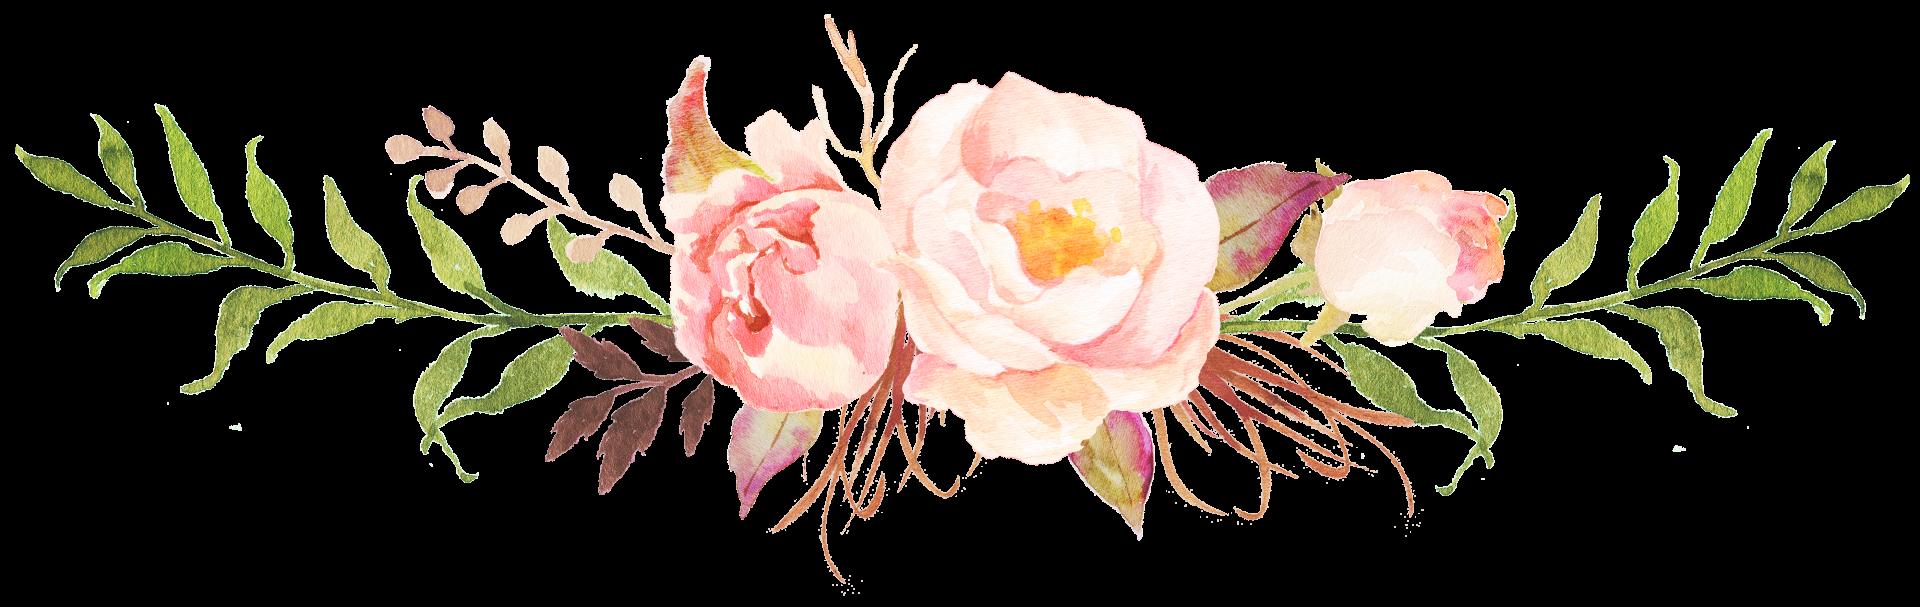 Flower bouquet3